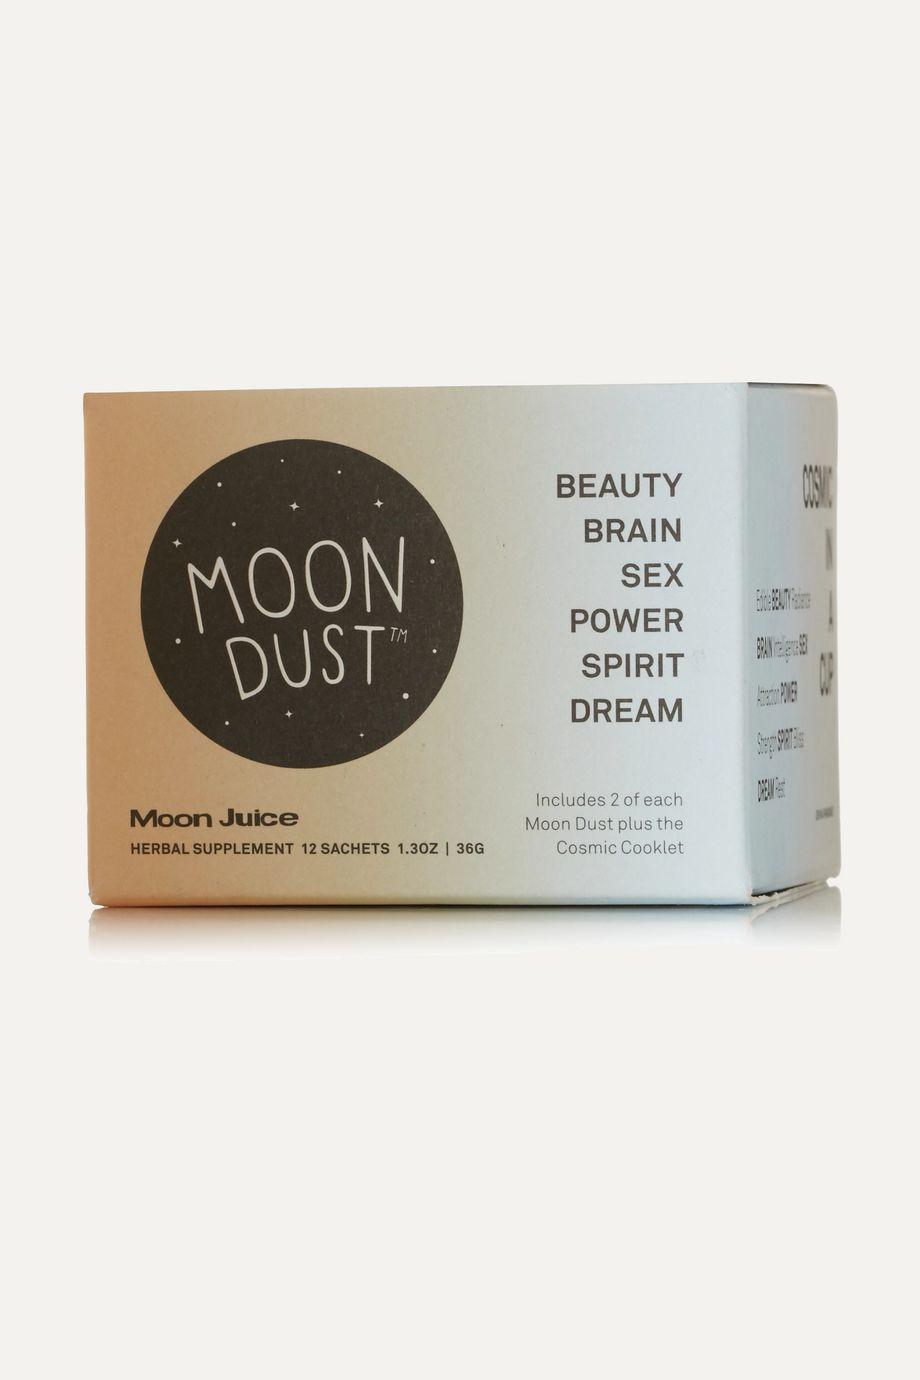 Moon Juice Moon Dust Sachet Sampler Box - 12 Days